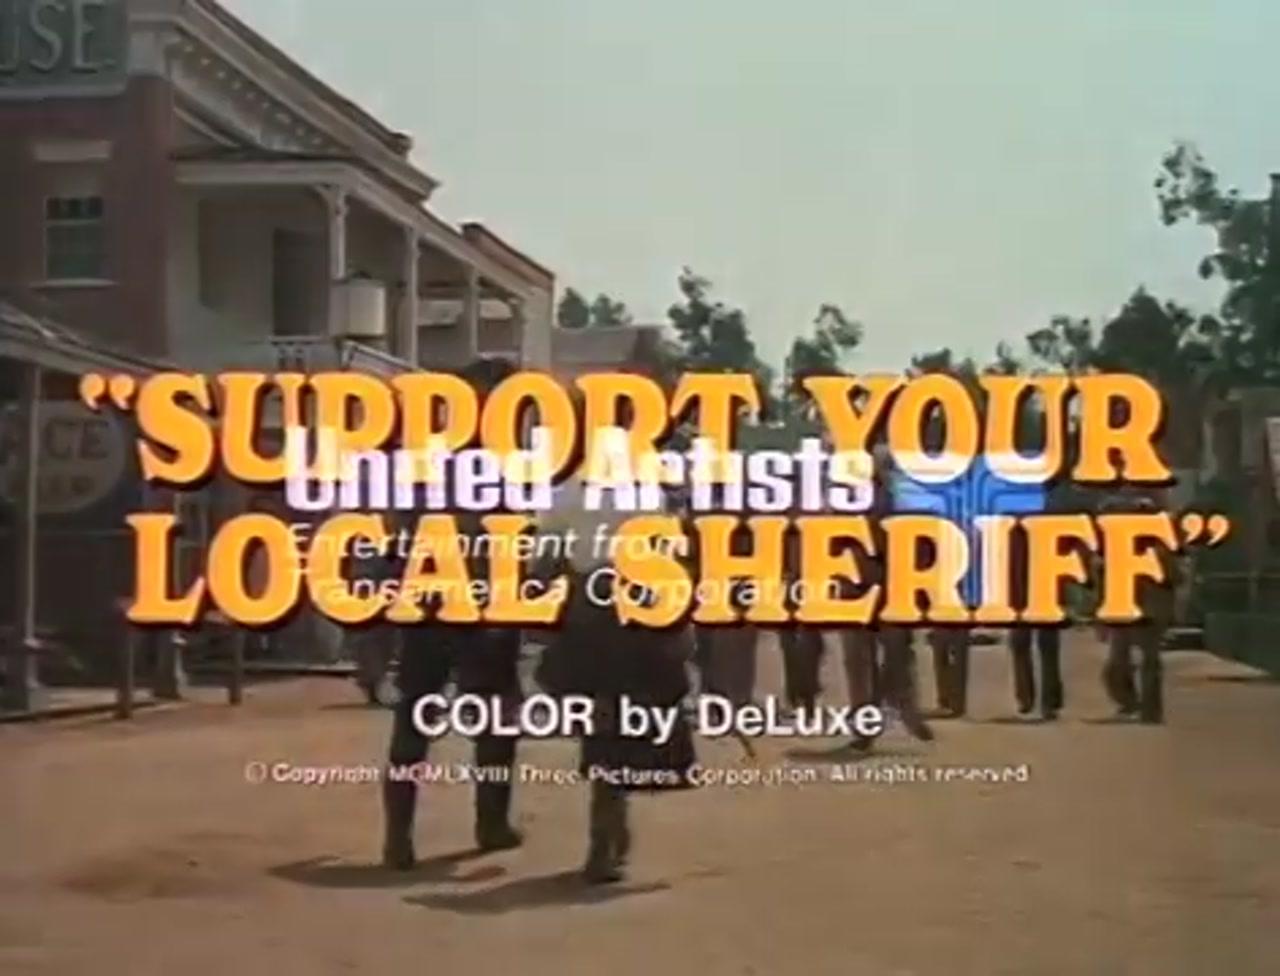 تریلر فیلم کلانتر بیباک Support Your Local Sheriff 1969